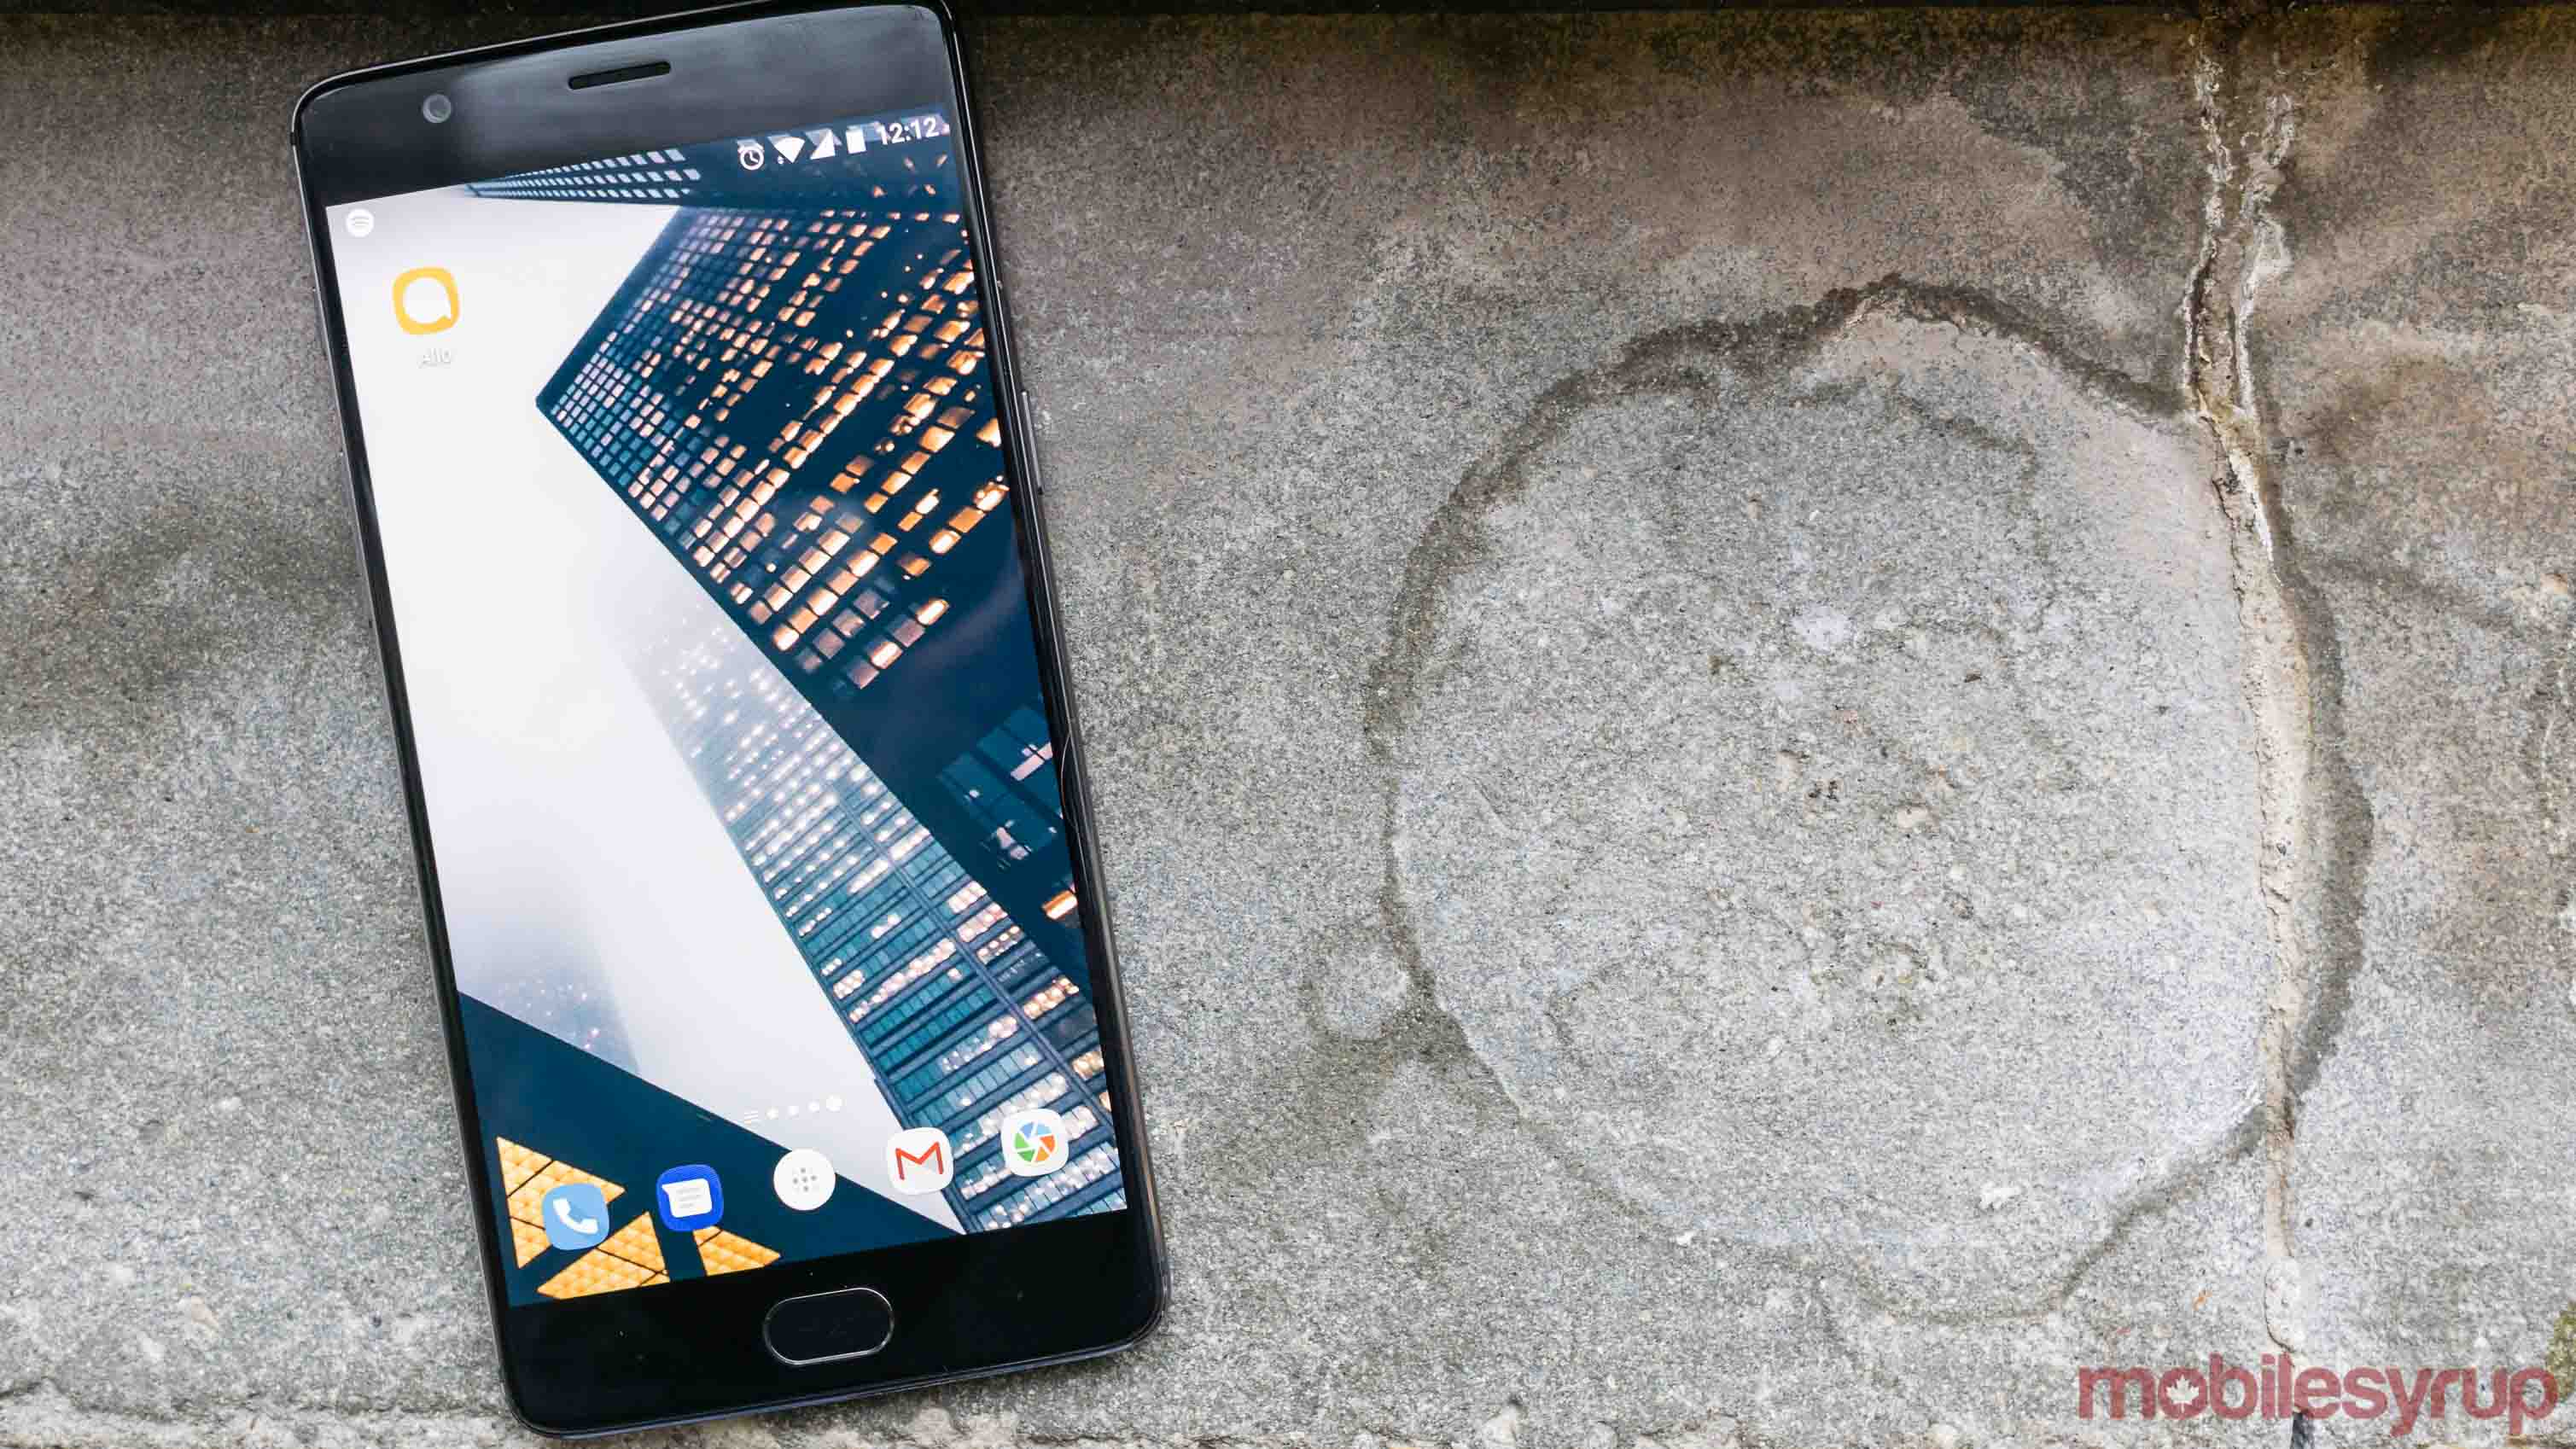 Google Allo update on OnePlus smartphone